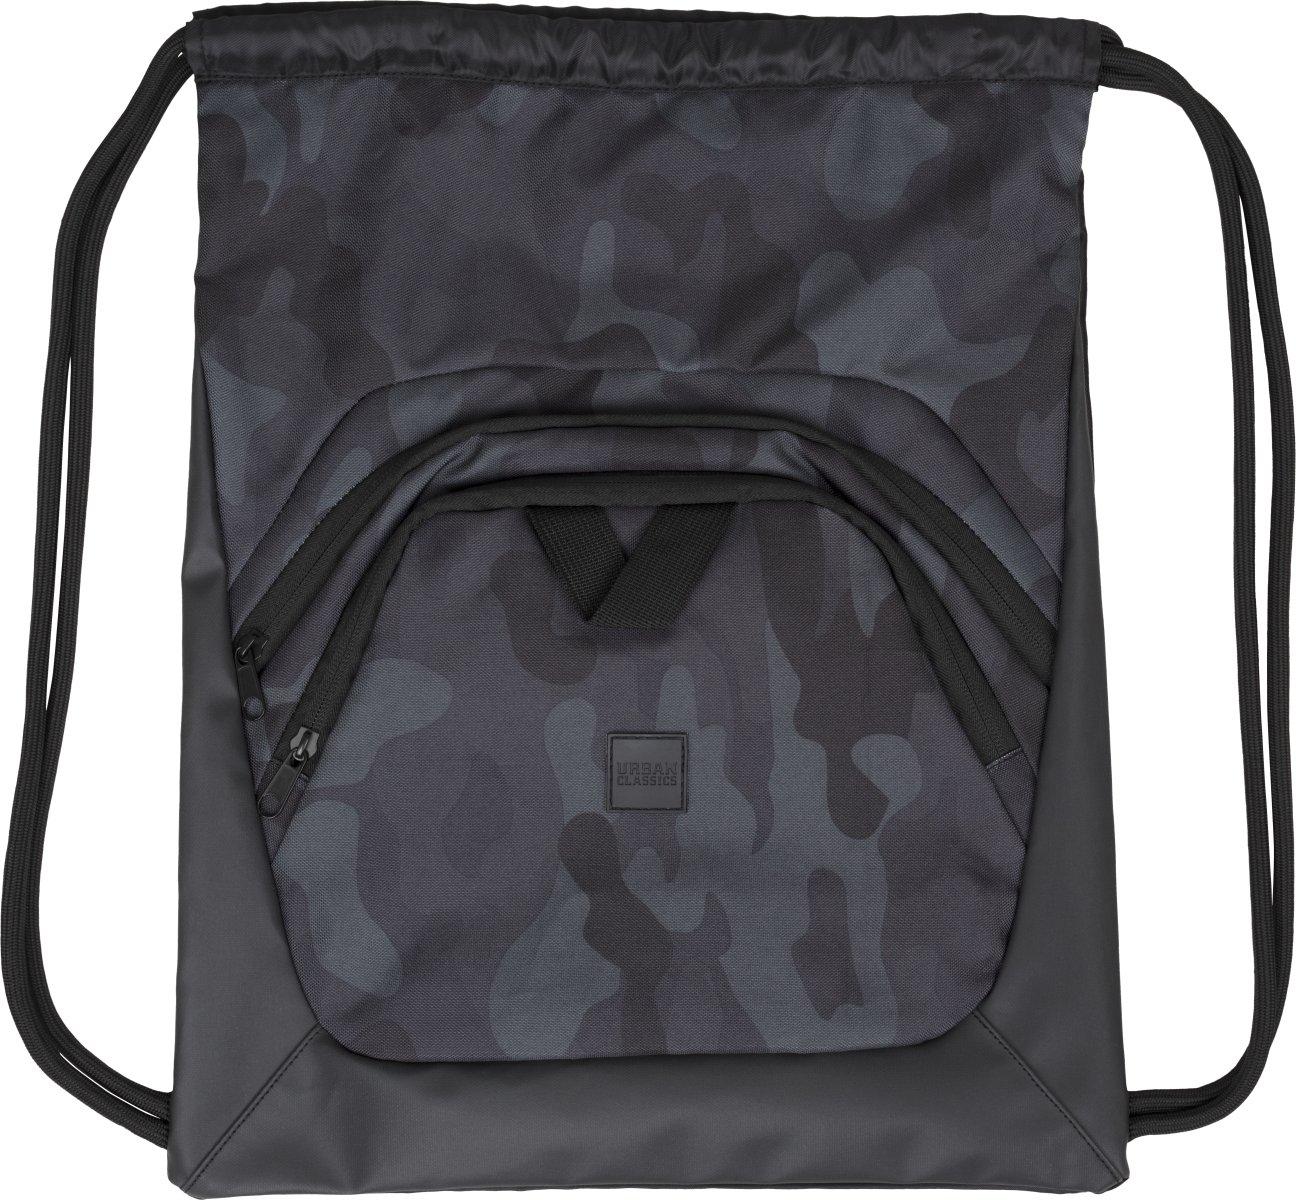 Urban Classics Ball Gym Bag Sac /à Cordon Multicolore Black//Dark Camo//Black 45 cm